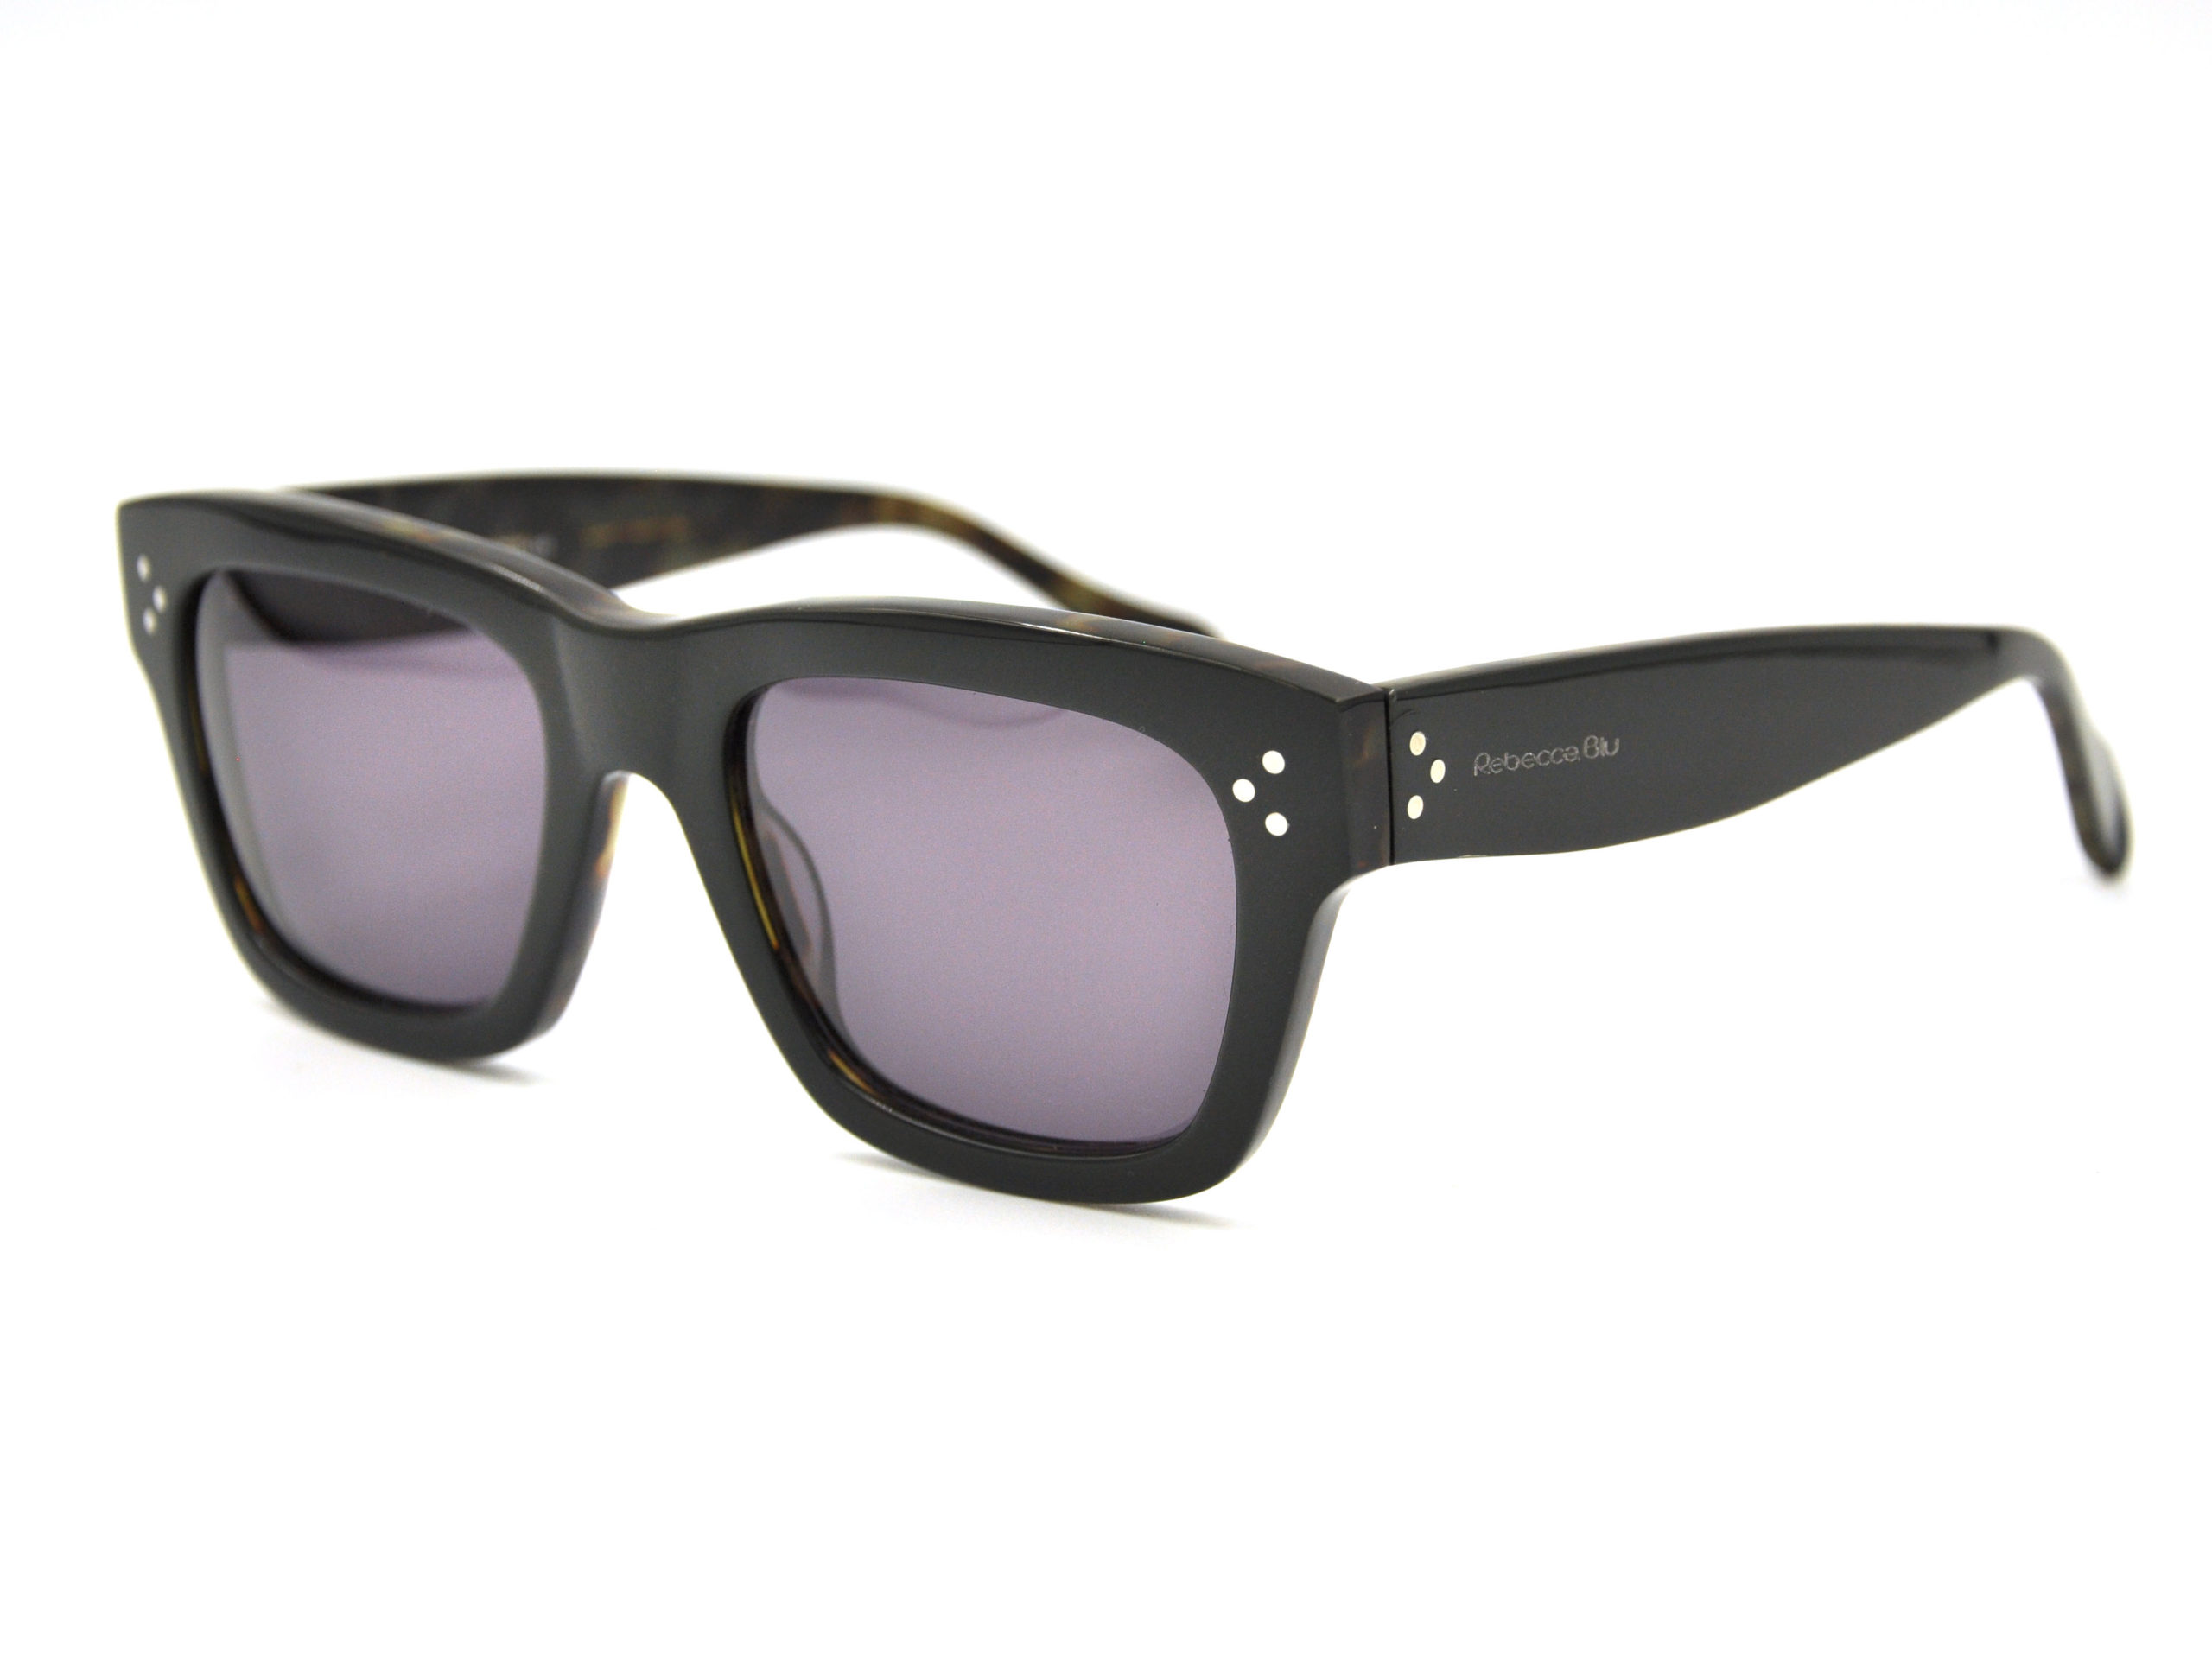 REBECCA BLU RB8577 RJ06 Sunglasses 2020